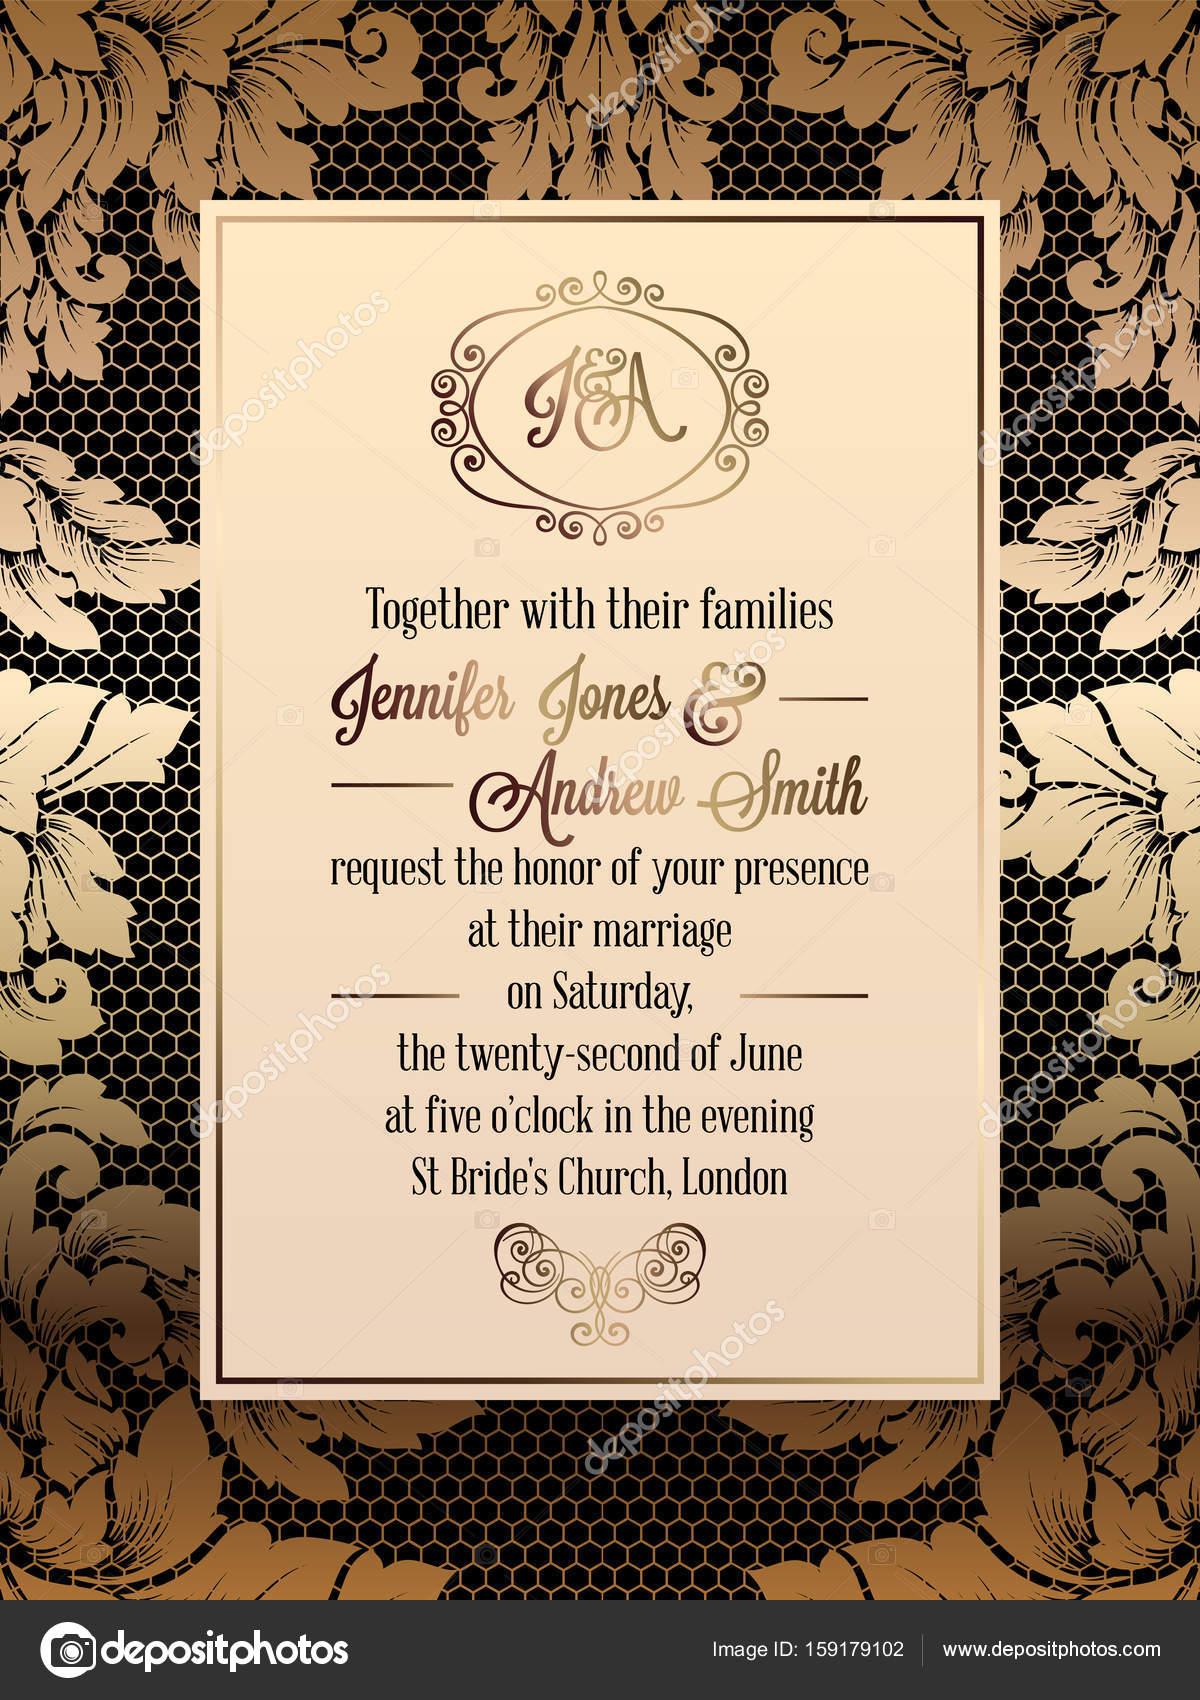 Vintage baroque style wedding invitation card template elegant vintage baroque style wedding invitation card template elegant formal design with damask background stopboris Gallery